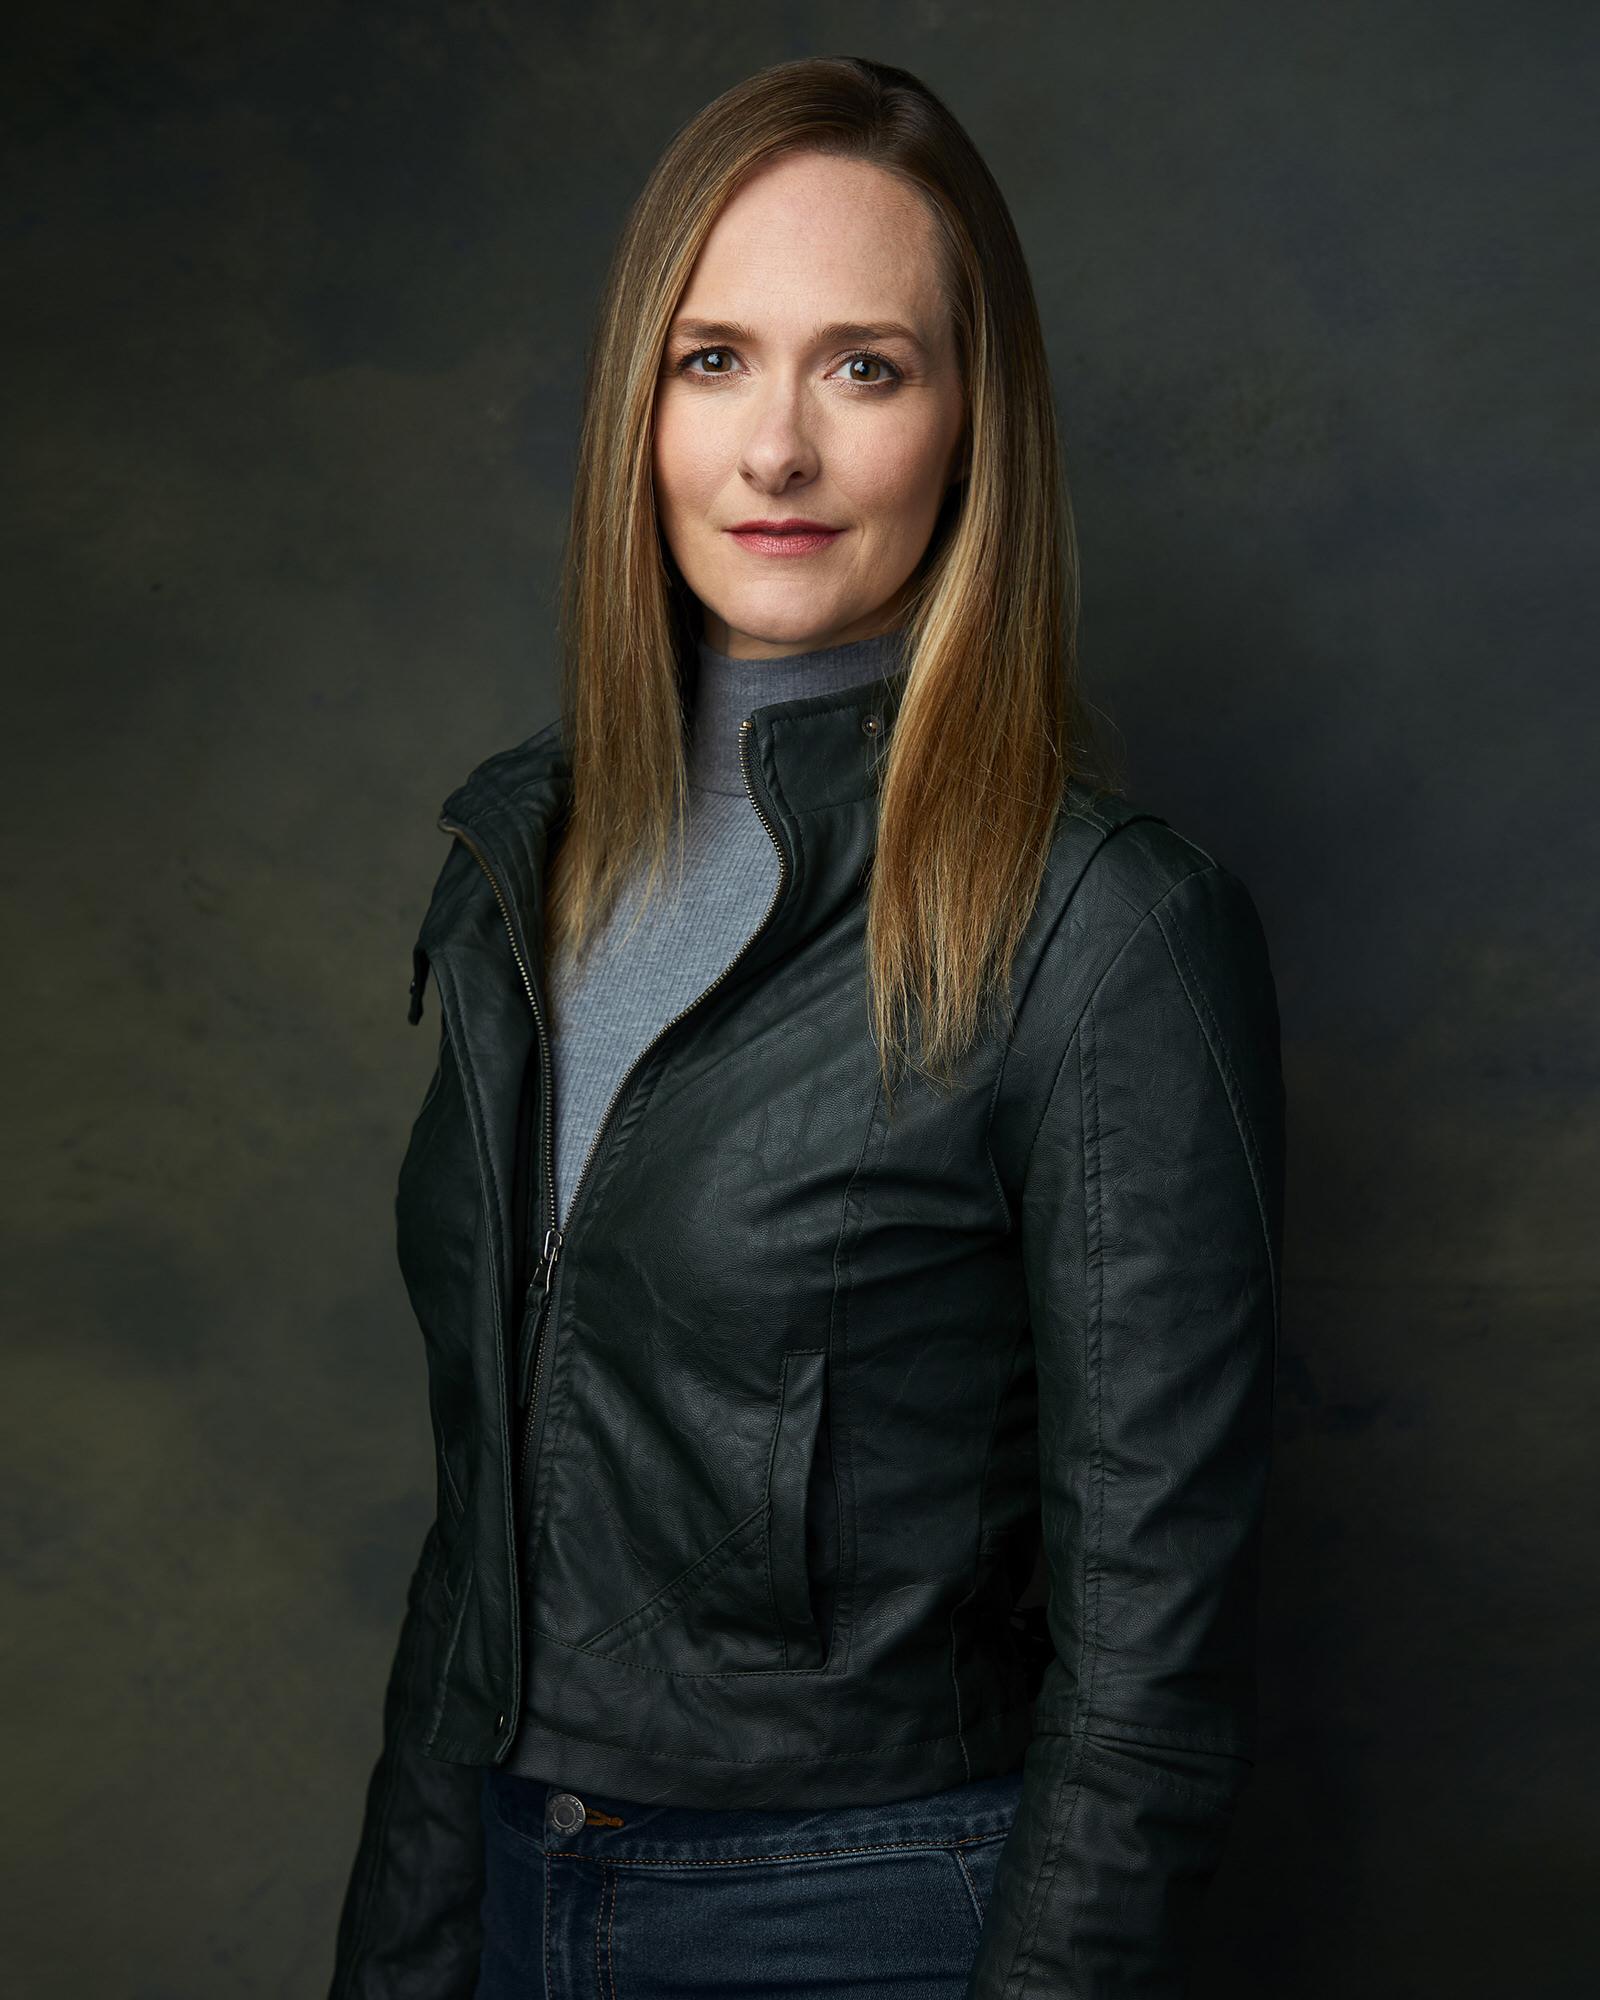 Kristi Hansen--Ryan-Parker-Photography-Edmonton-Headshots-Alberta-Headshot-Portrait-Photographer-Corporate-Actor-Business-Professional-Acting-Studio-Calgary.jpg